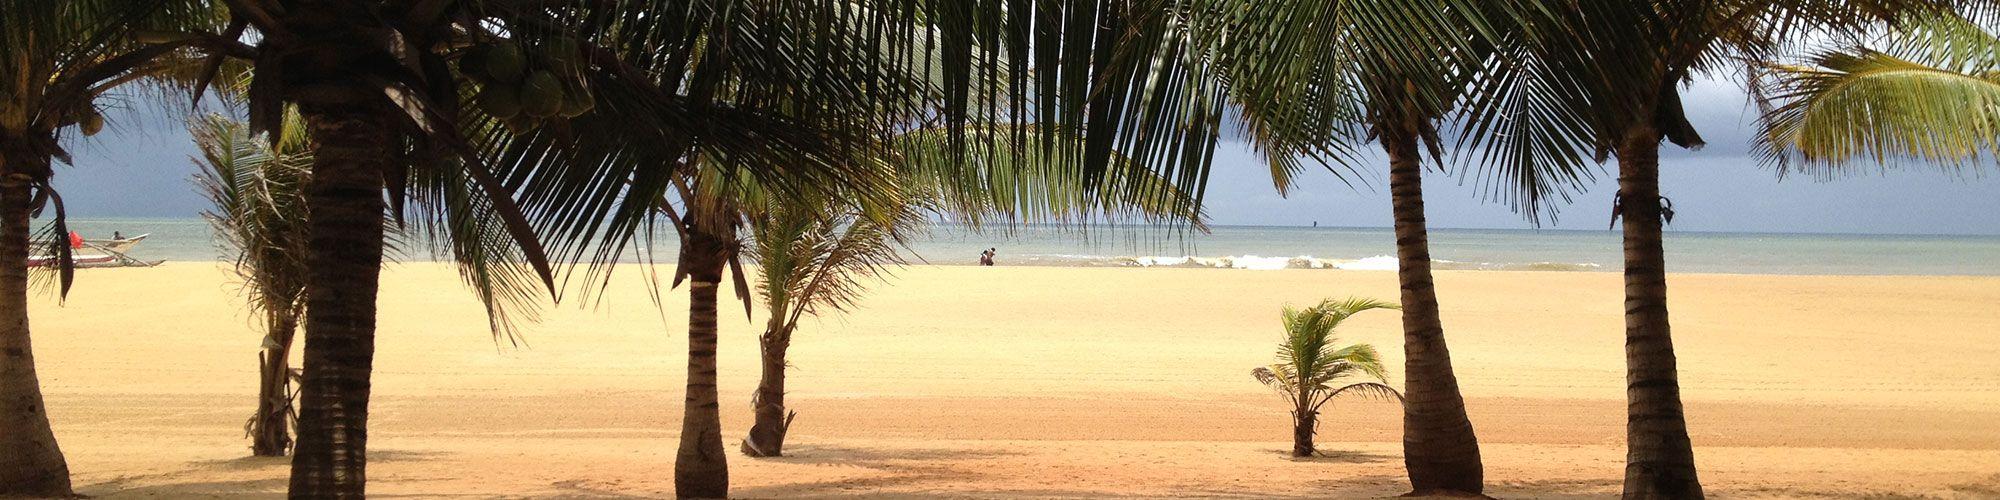 Sri Lanka, Plage, Negombo